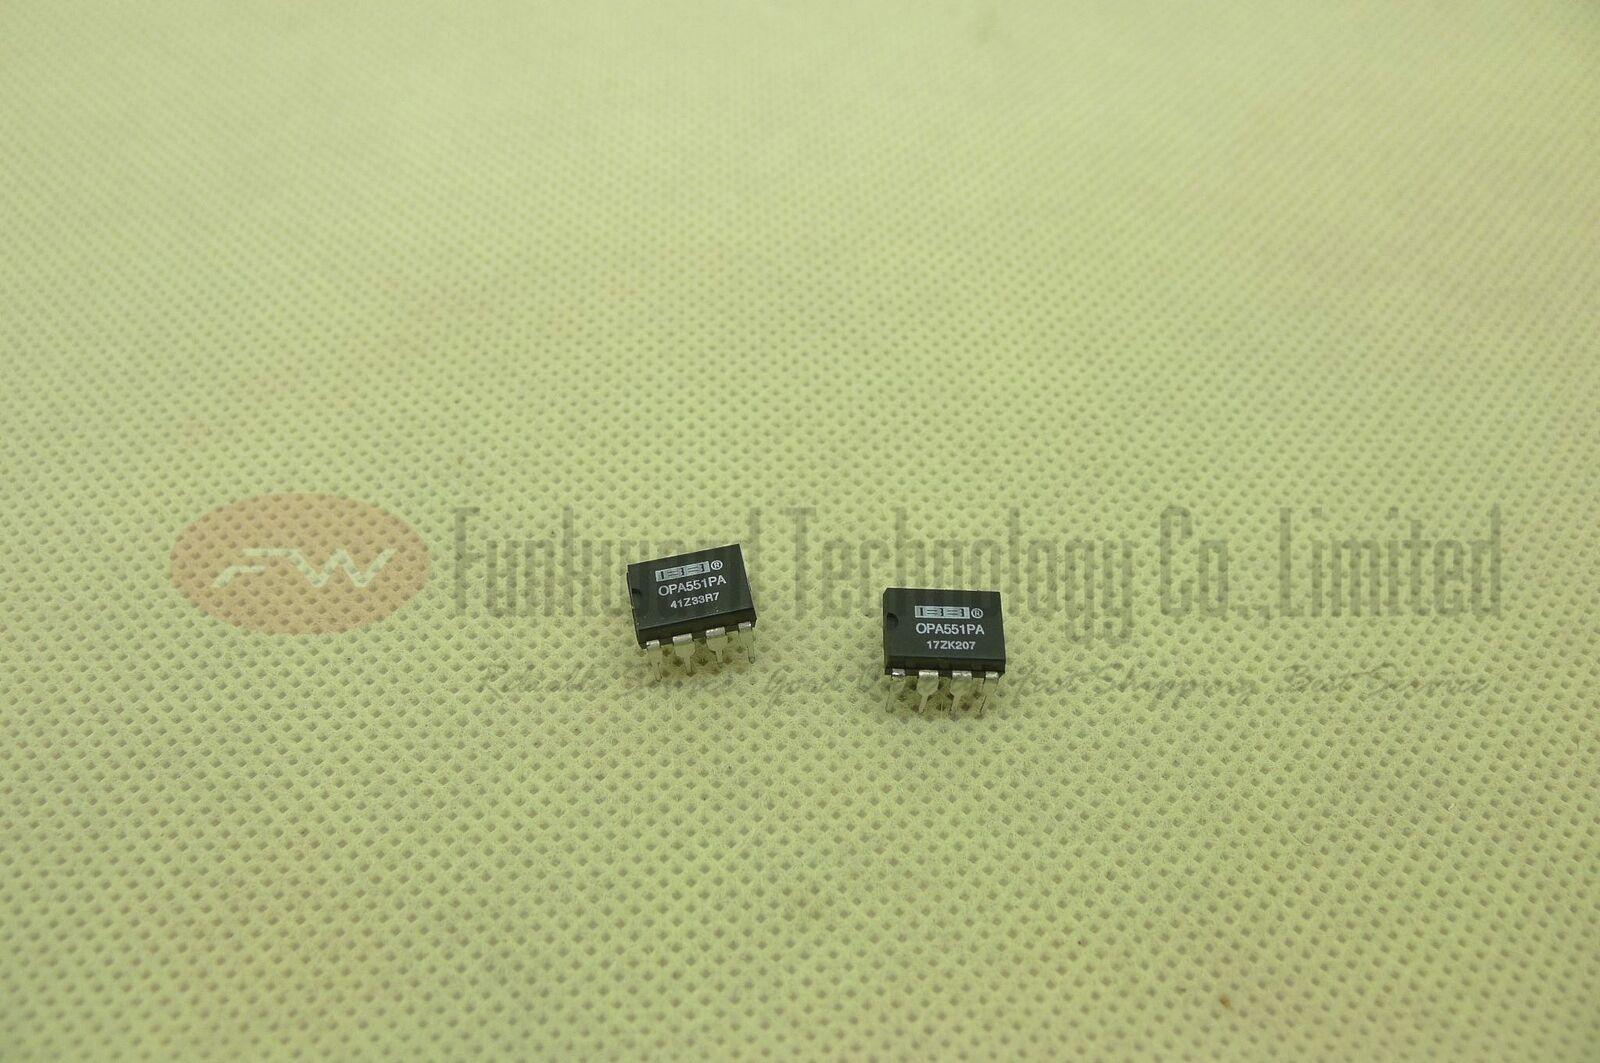 1 x OPA551PA OPA551 DIP8 Micropower High Accuracy